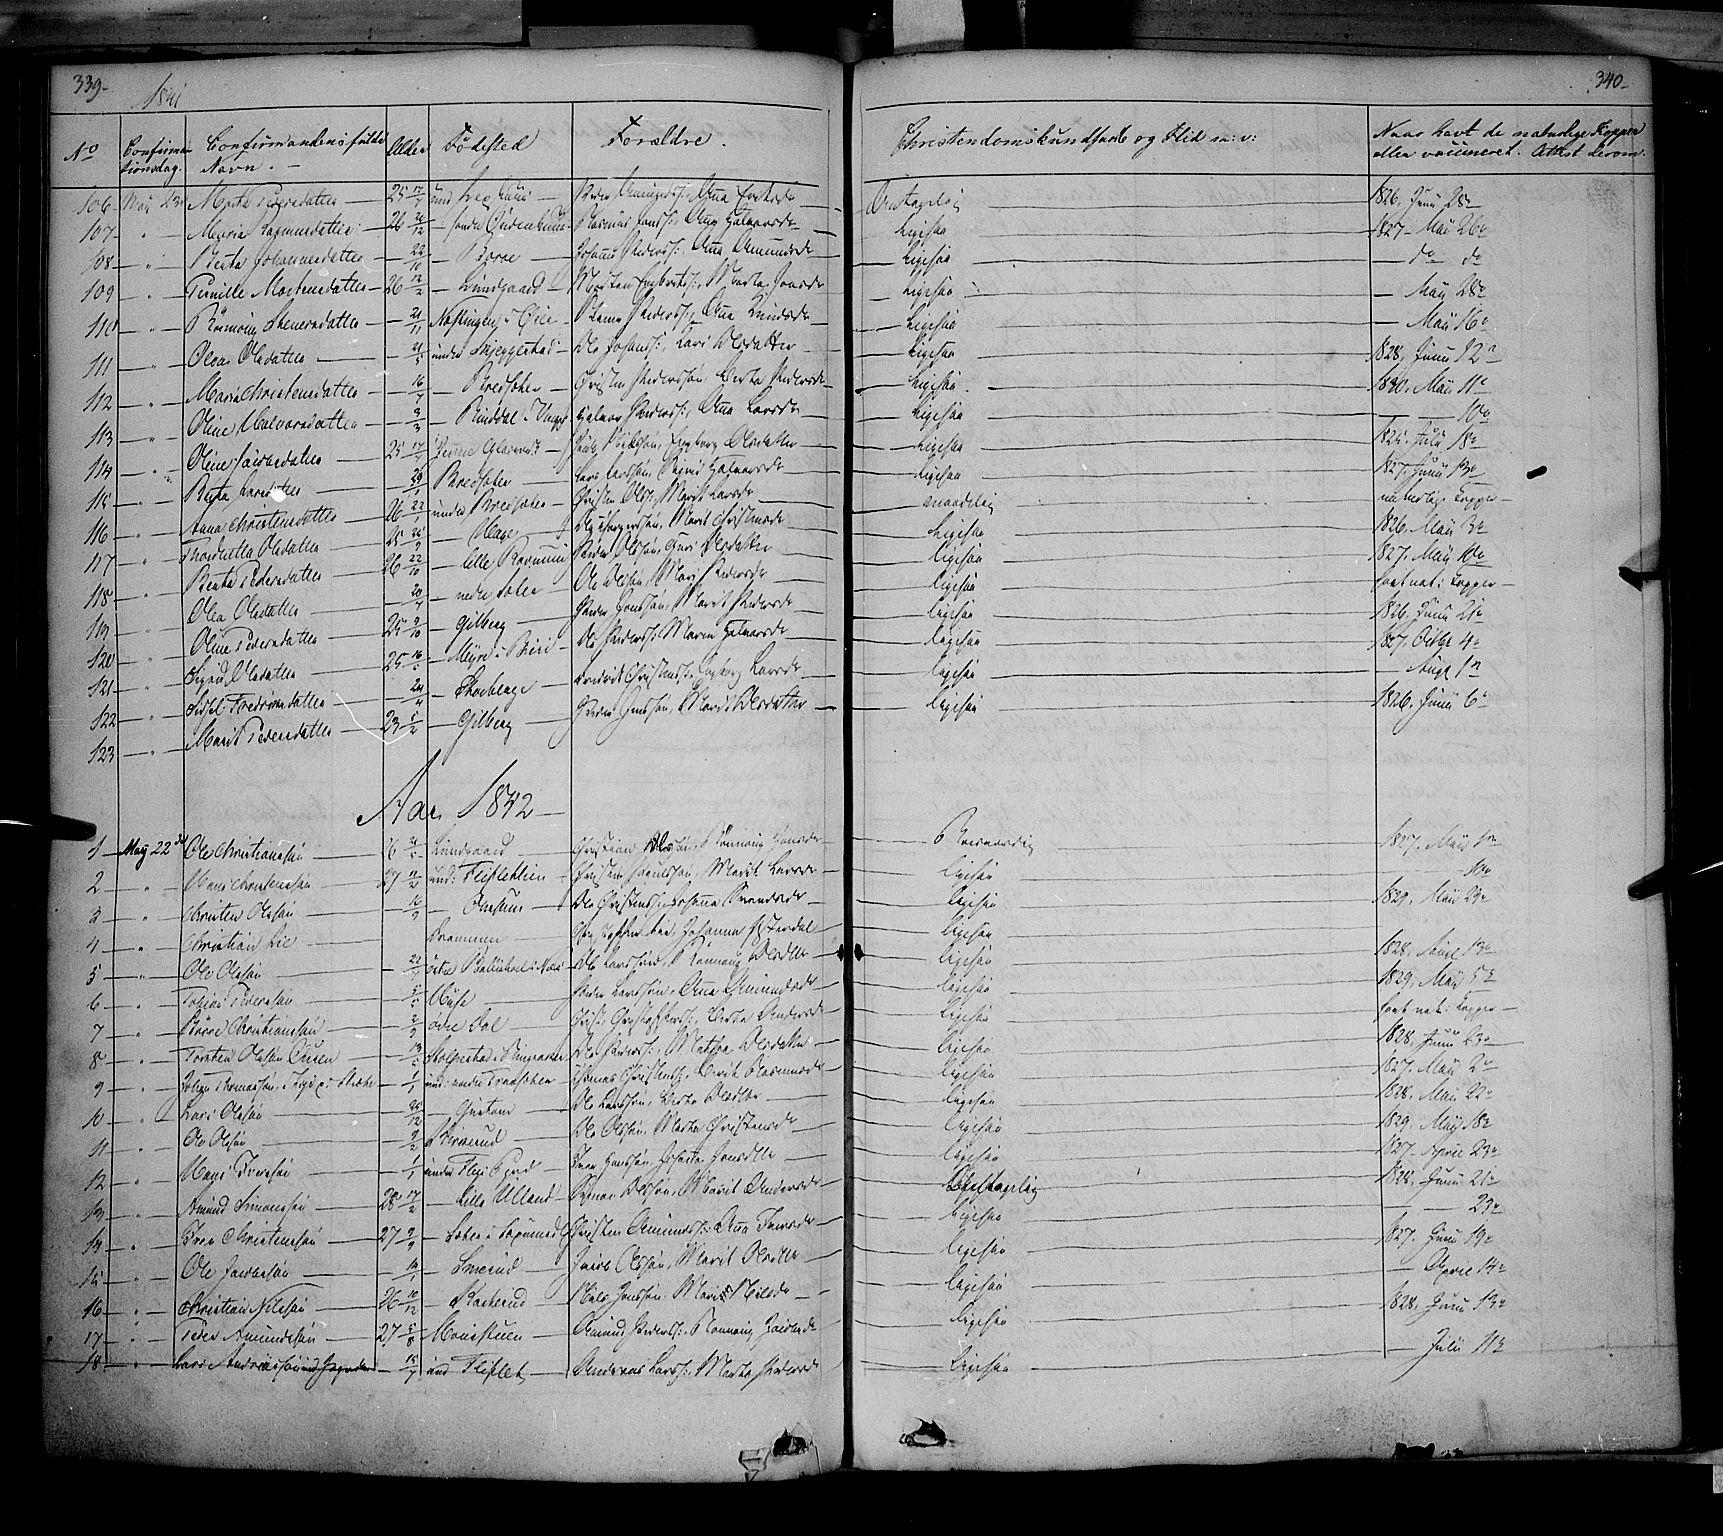 SAH, Fåberg prestekontor, Ministerialbok nr. 5, 1836-1854, s. 339-340